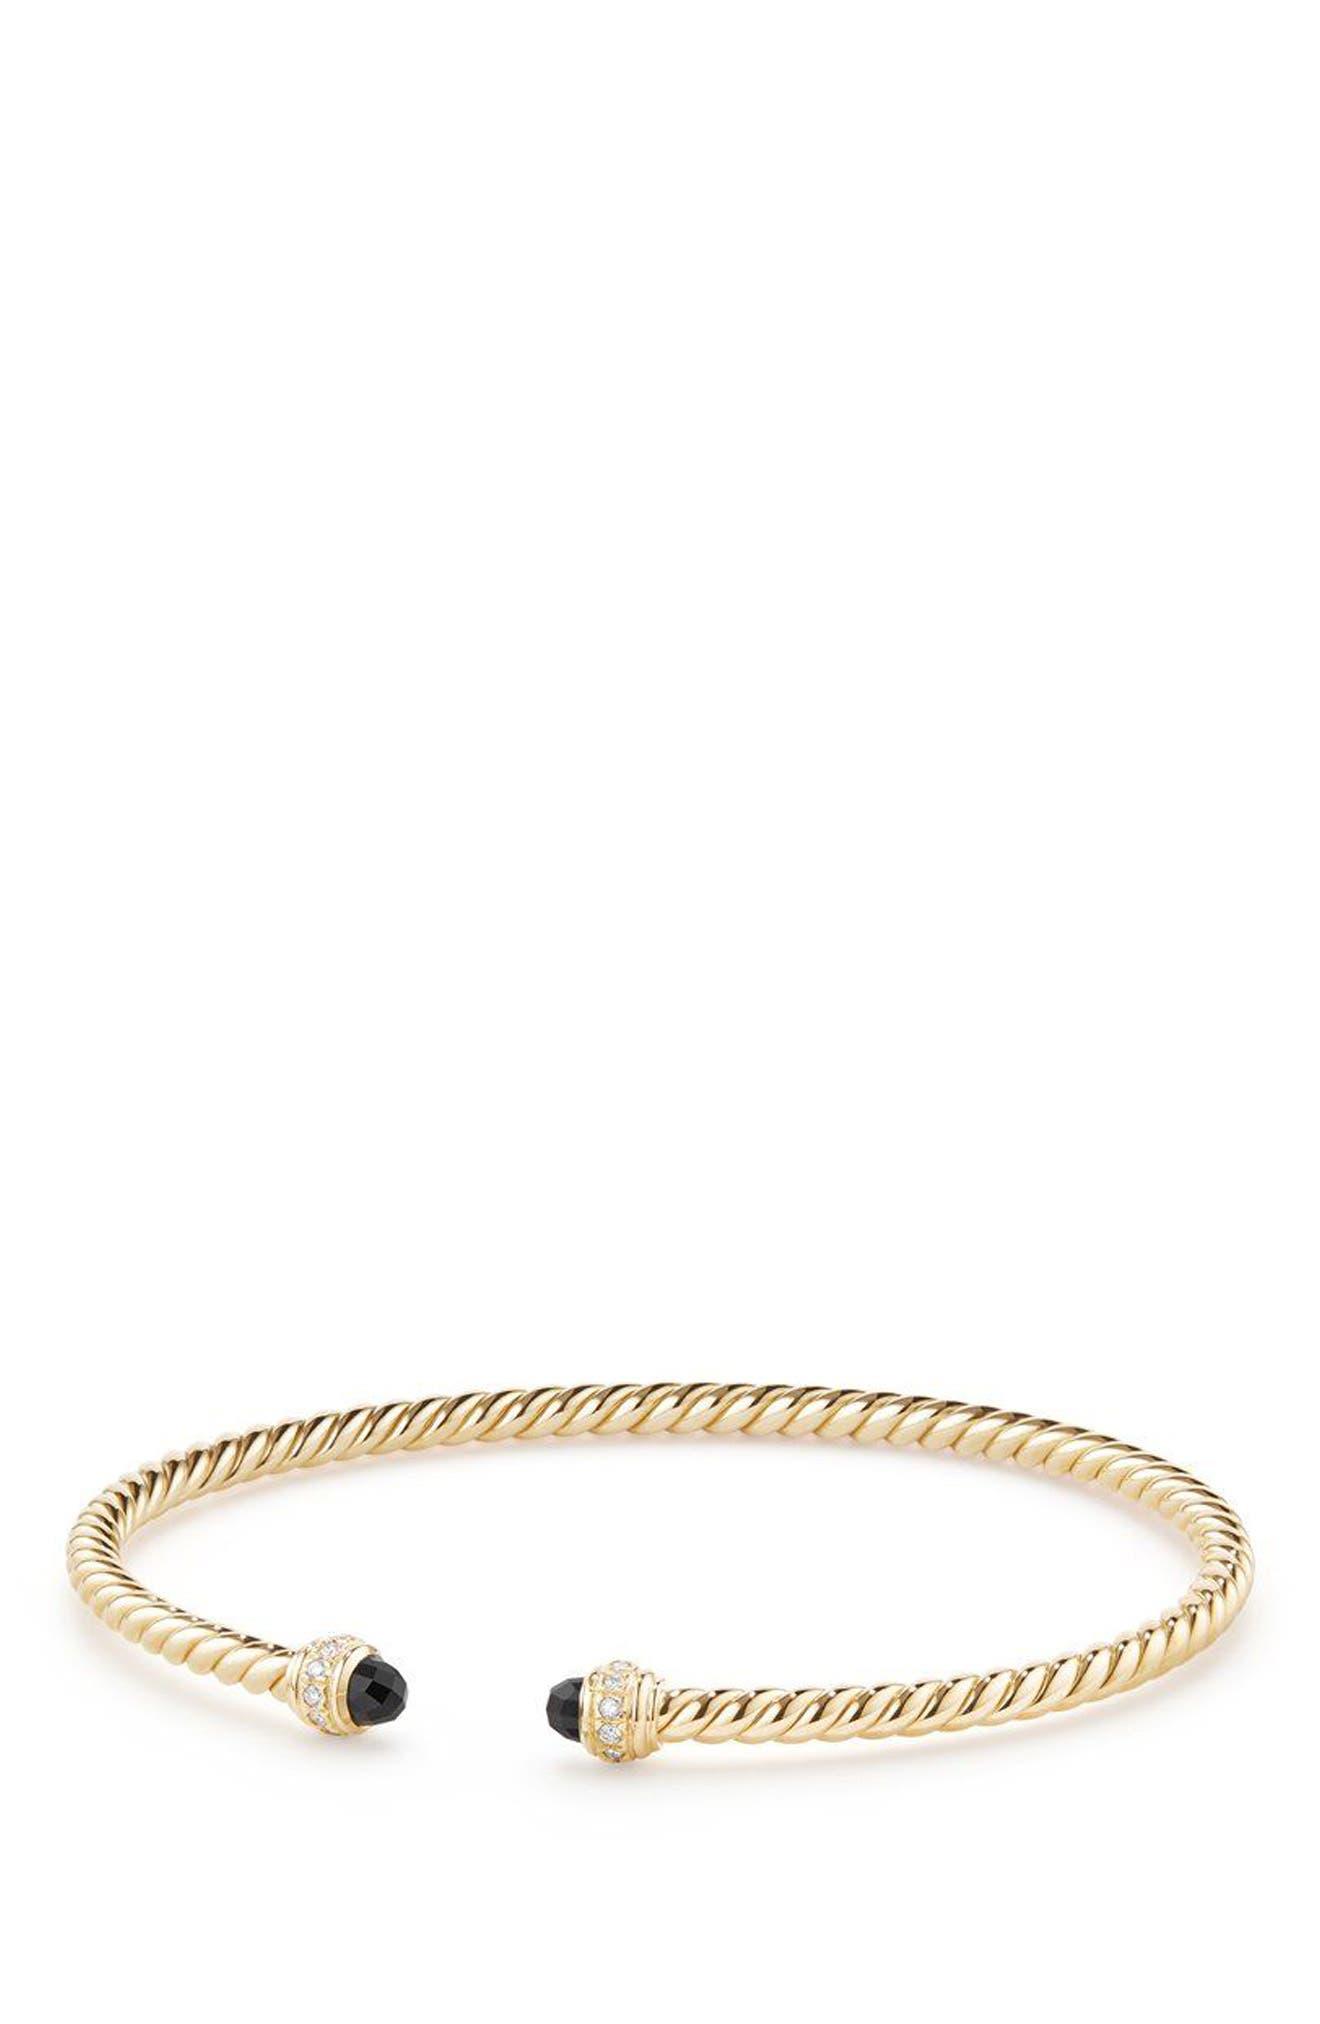 Alternate Image 1 Selected - David Yurman Cable Spira Bracelet in 18K Gold with Diamonds, 3mm